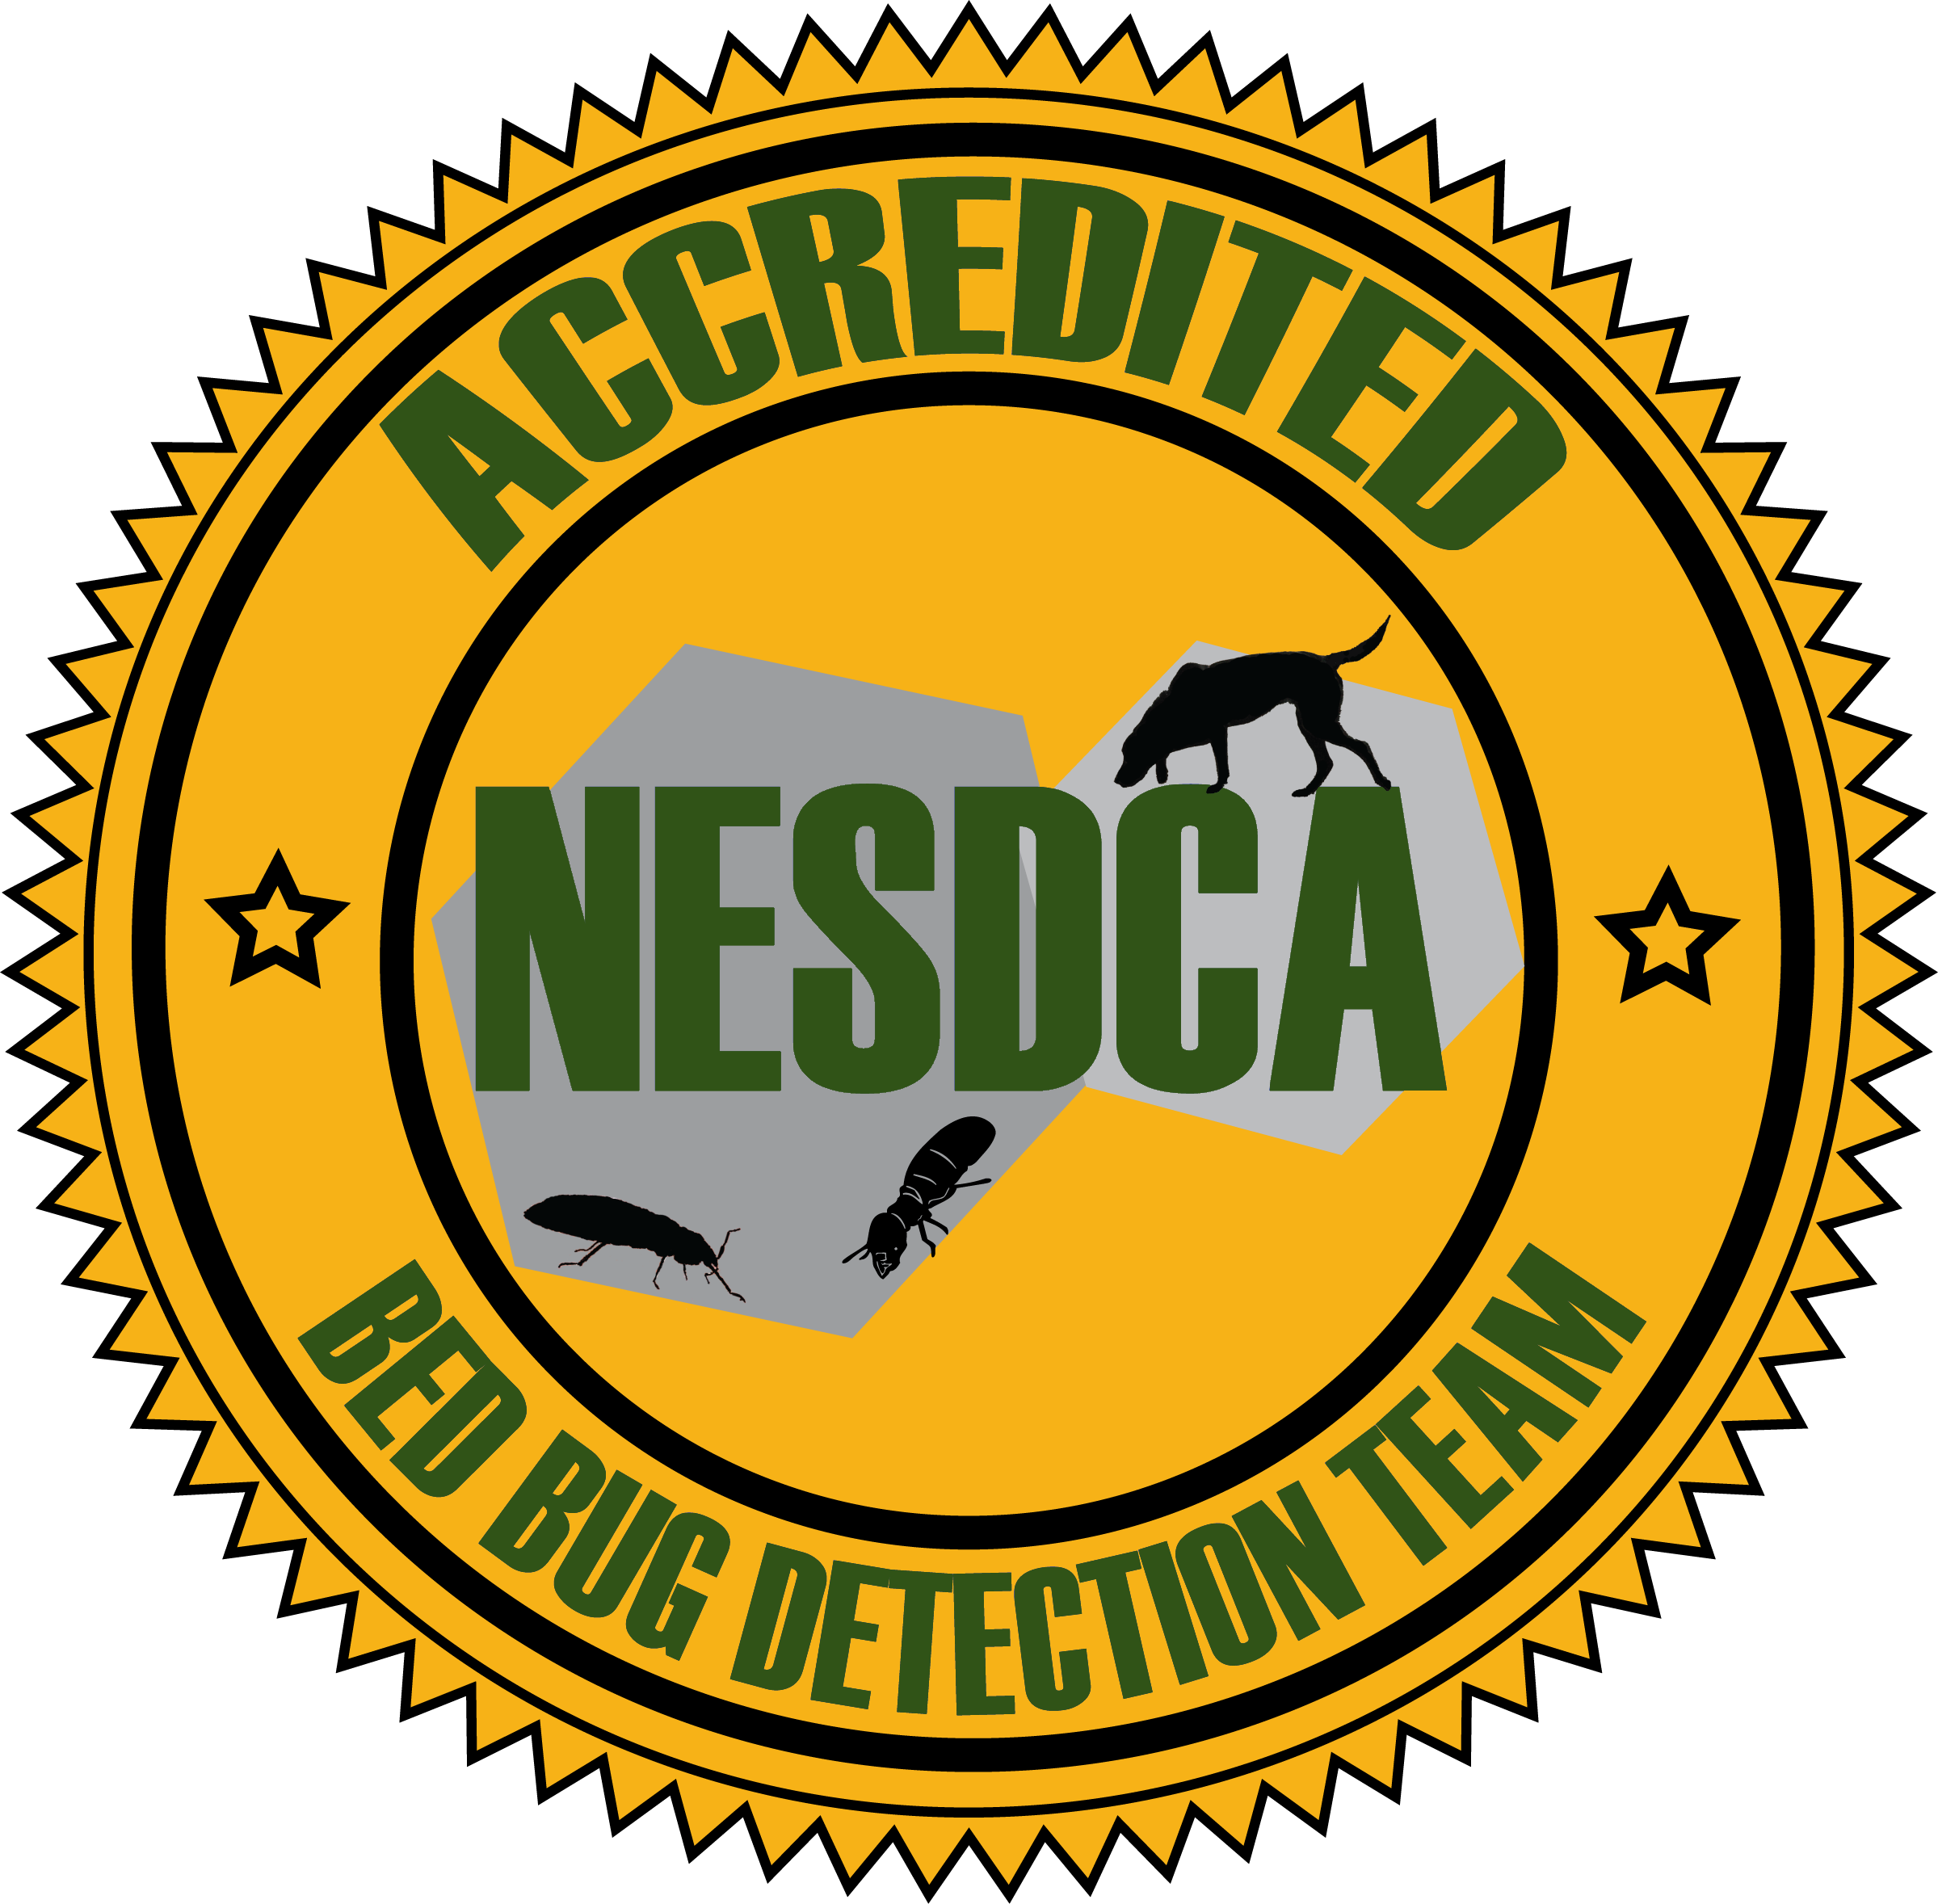 NESDCA Logo